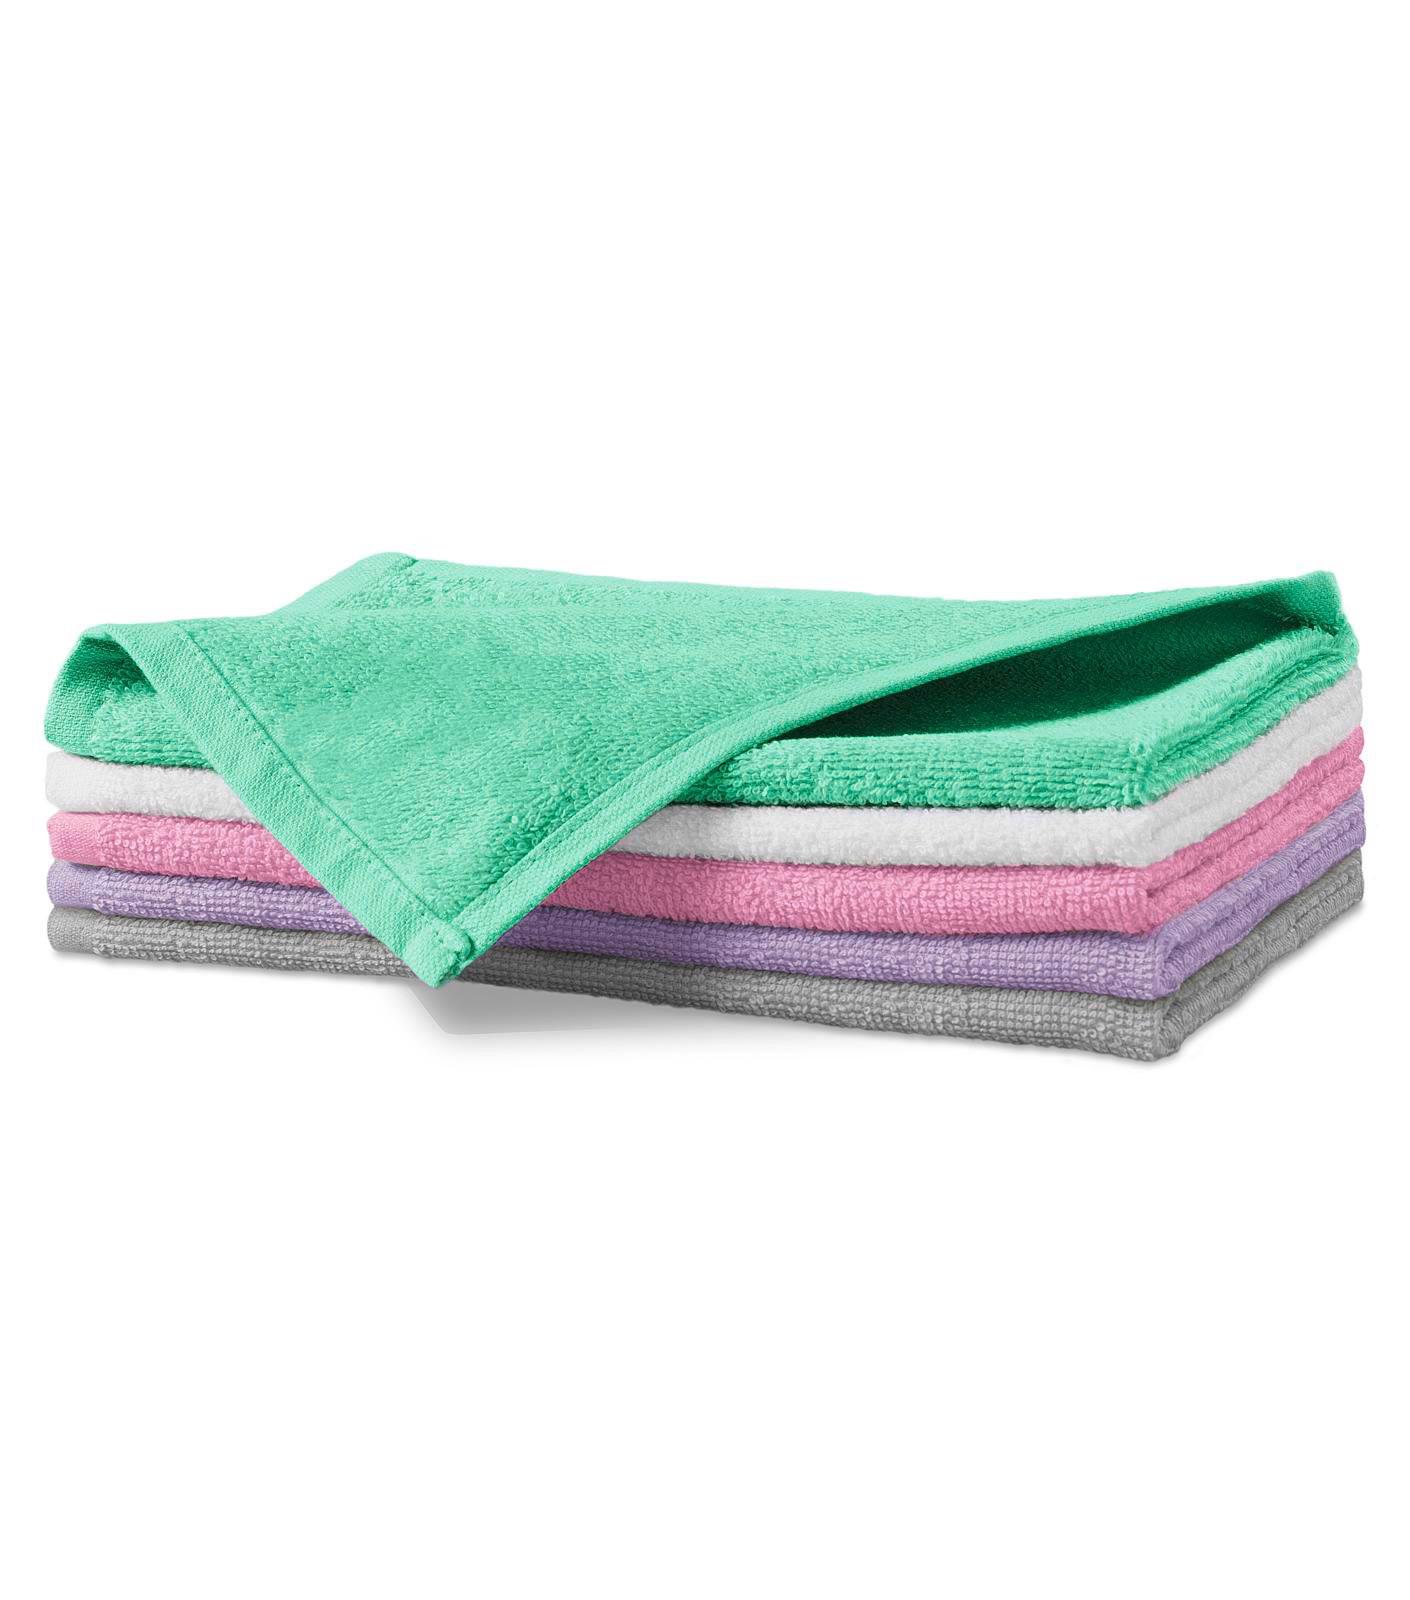 Malý ručník unisex Malfini Terry Hand Towel - Světle Šedá / 30 x 50 cm